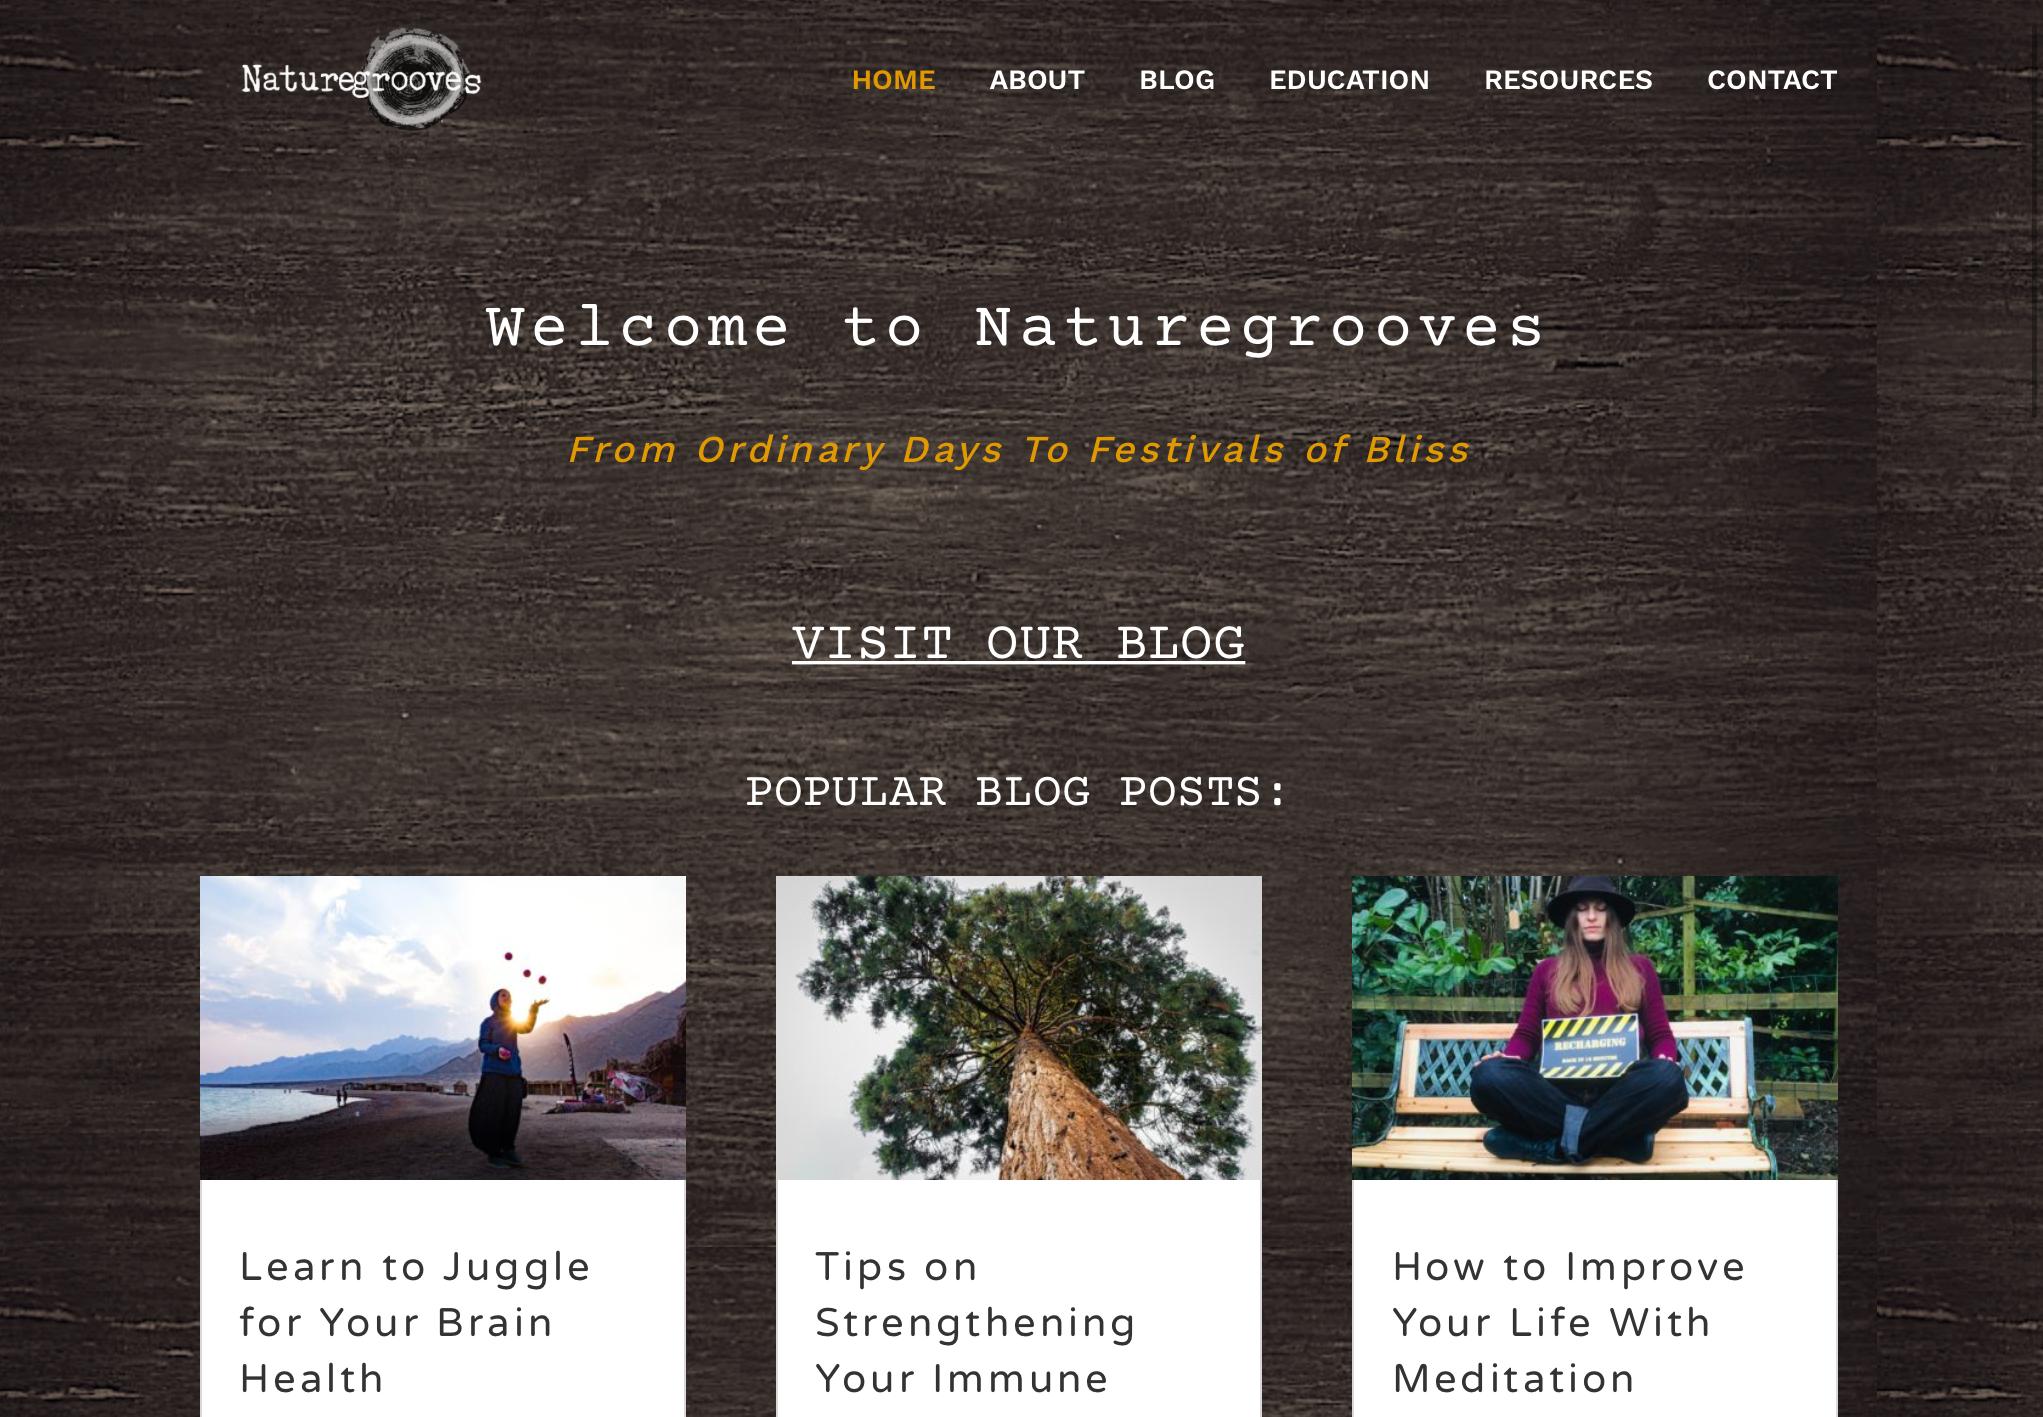 https://naturegrooves.com/